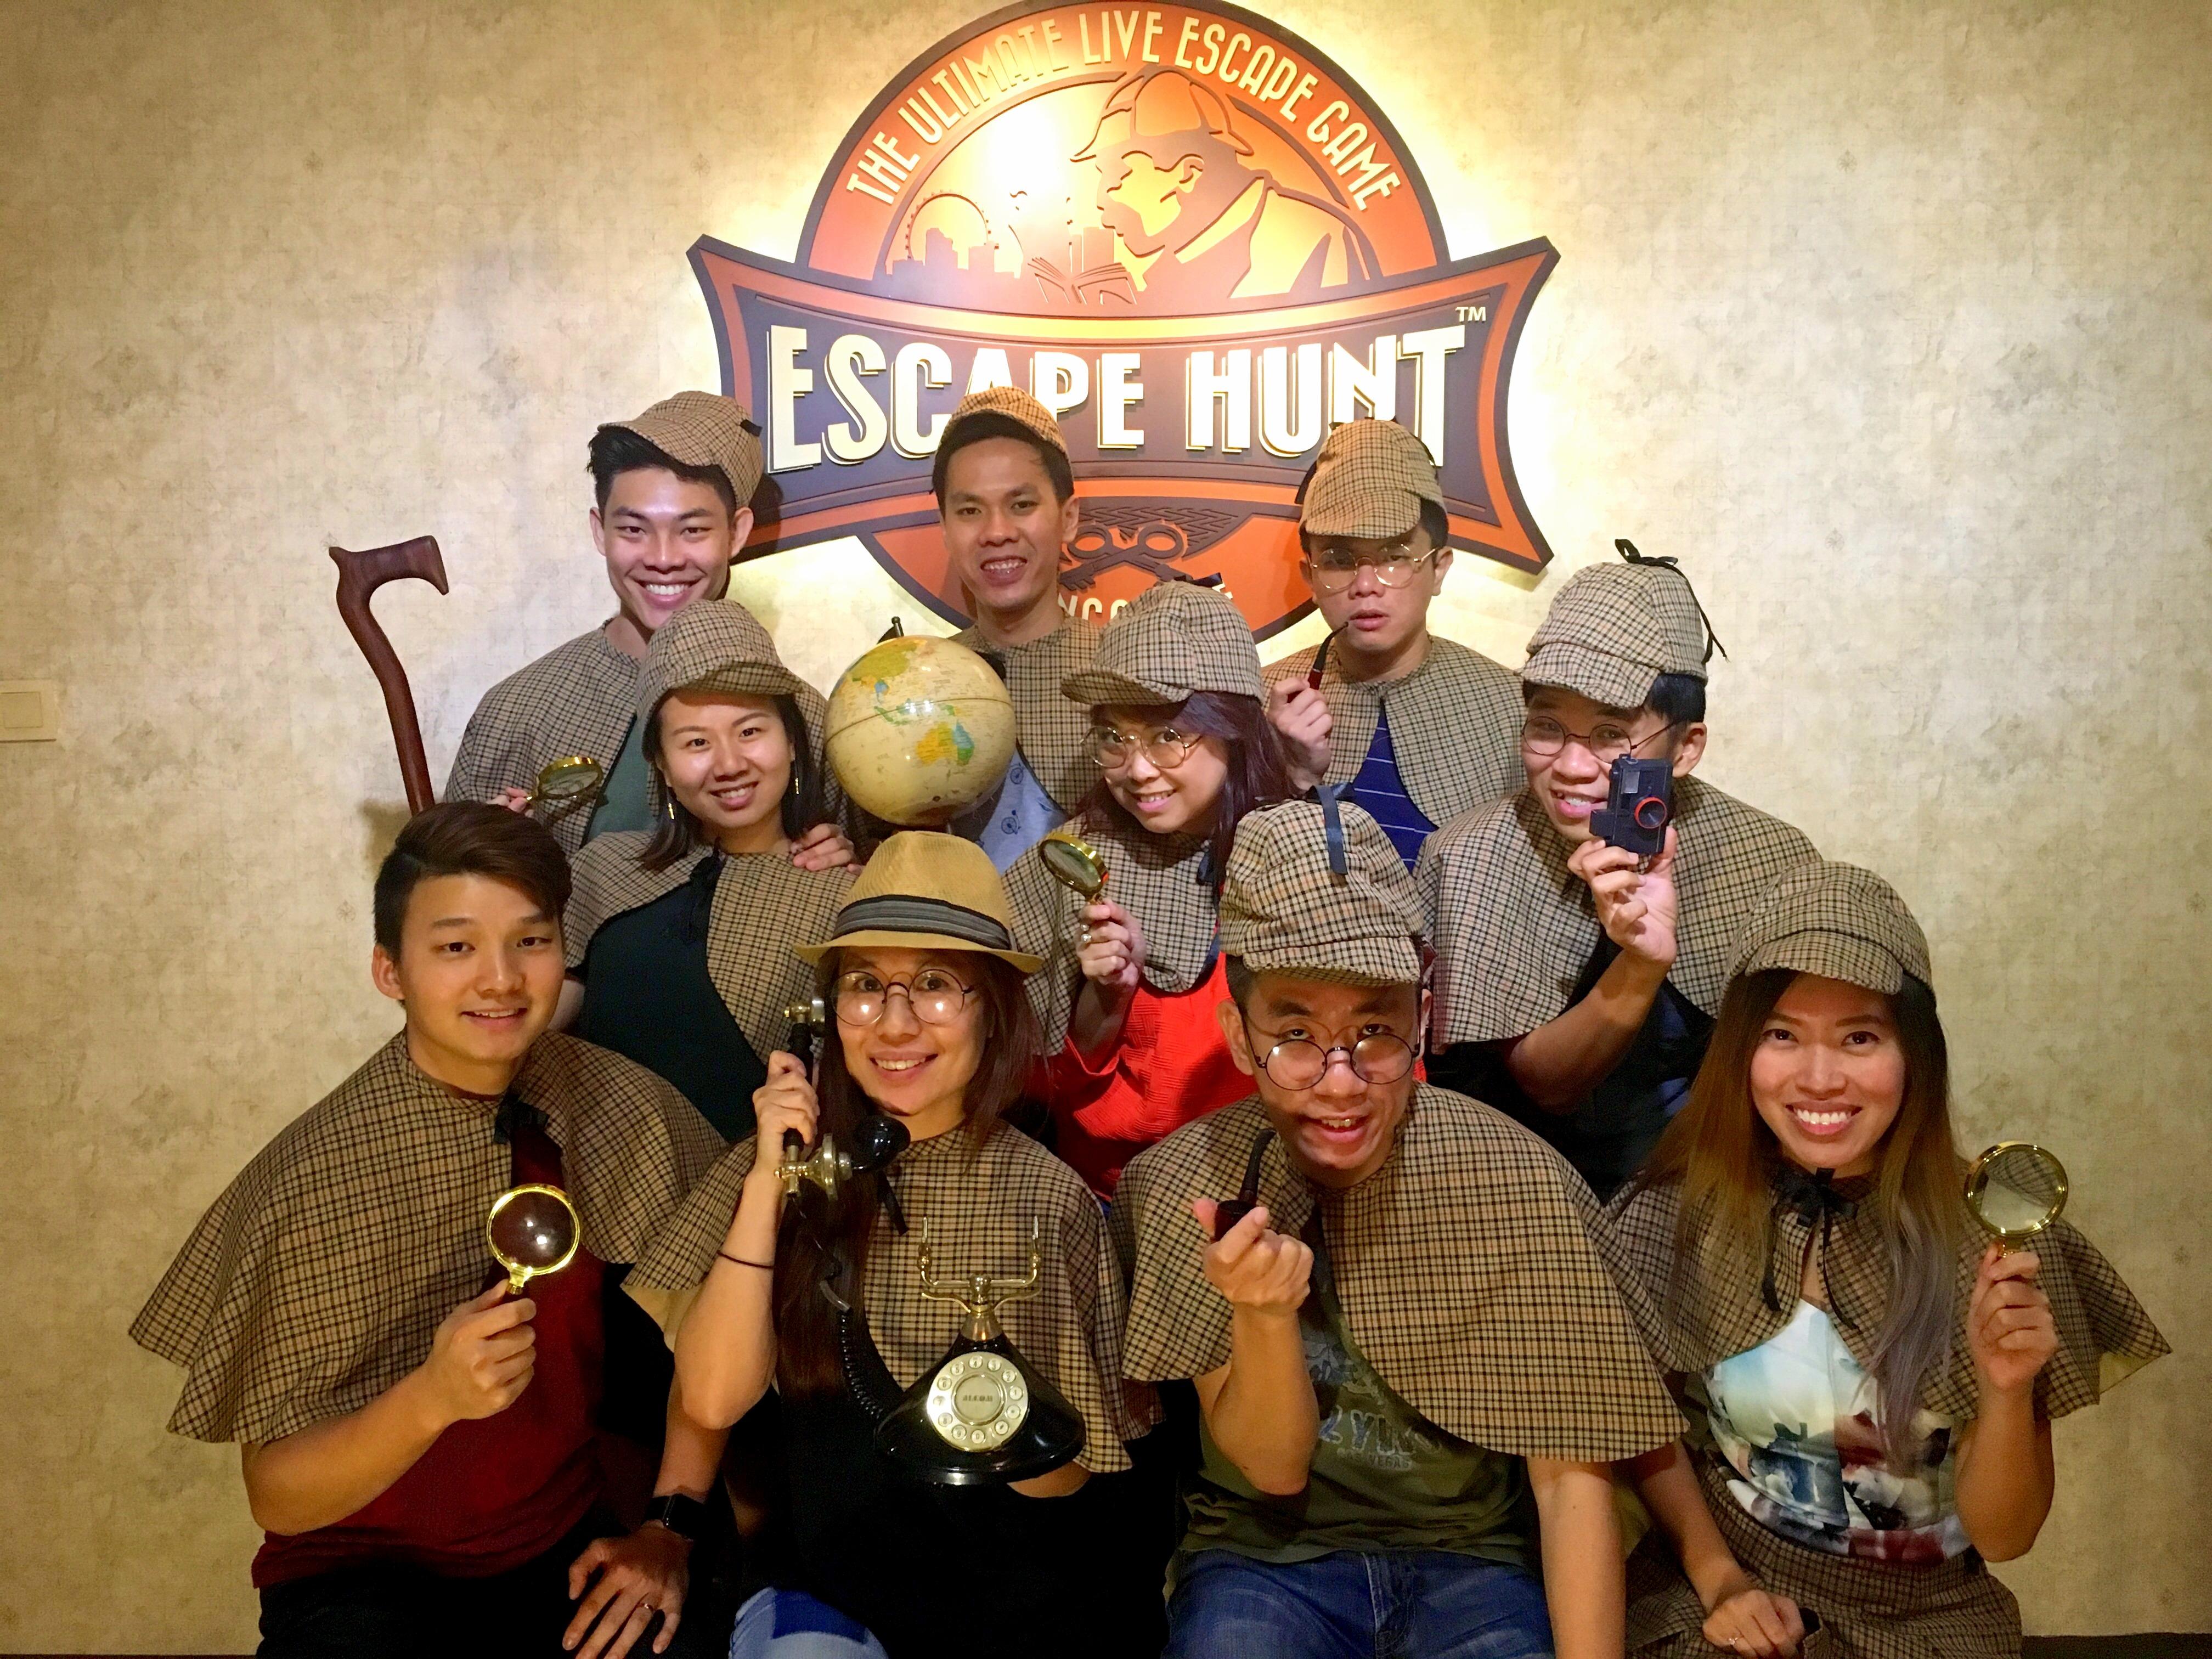 Escape Room Games - Escape Hunt Singapore